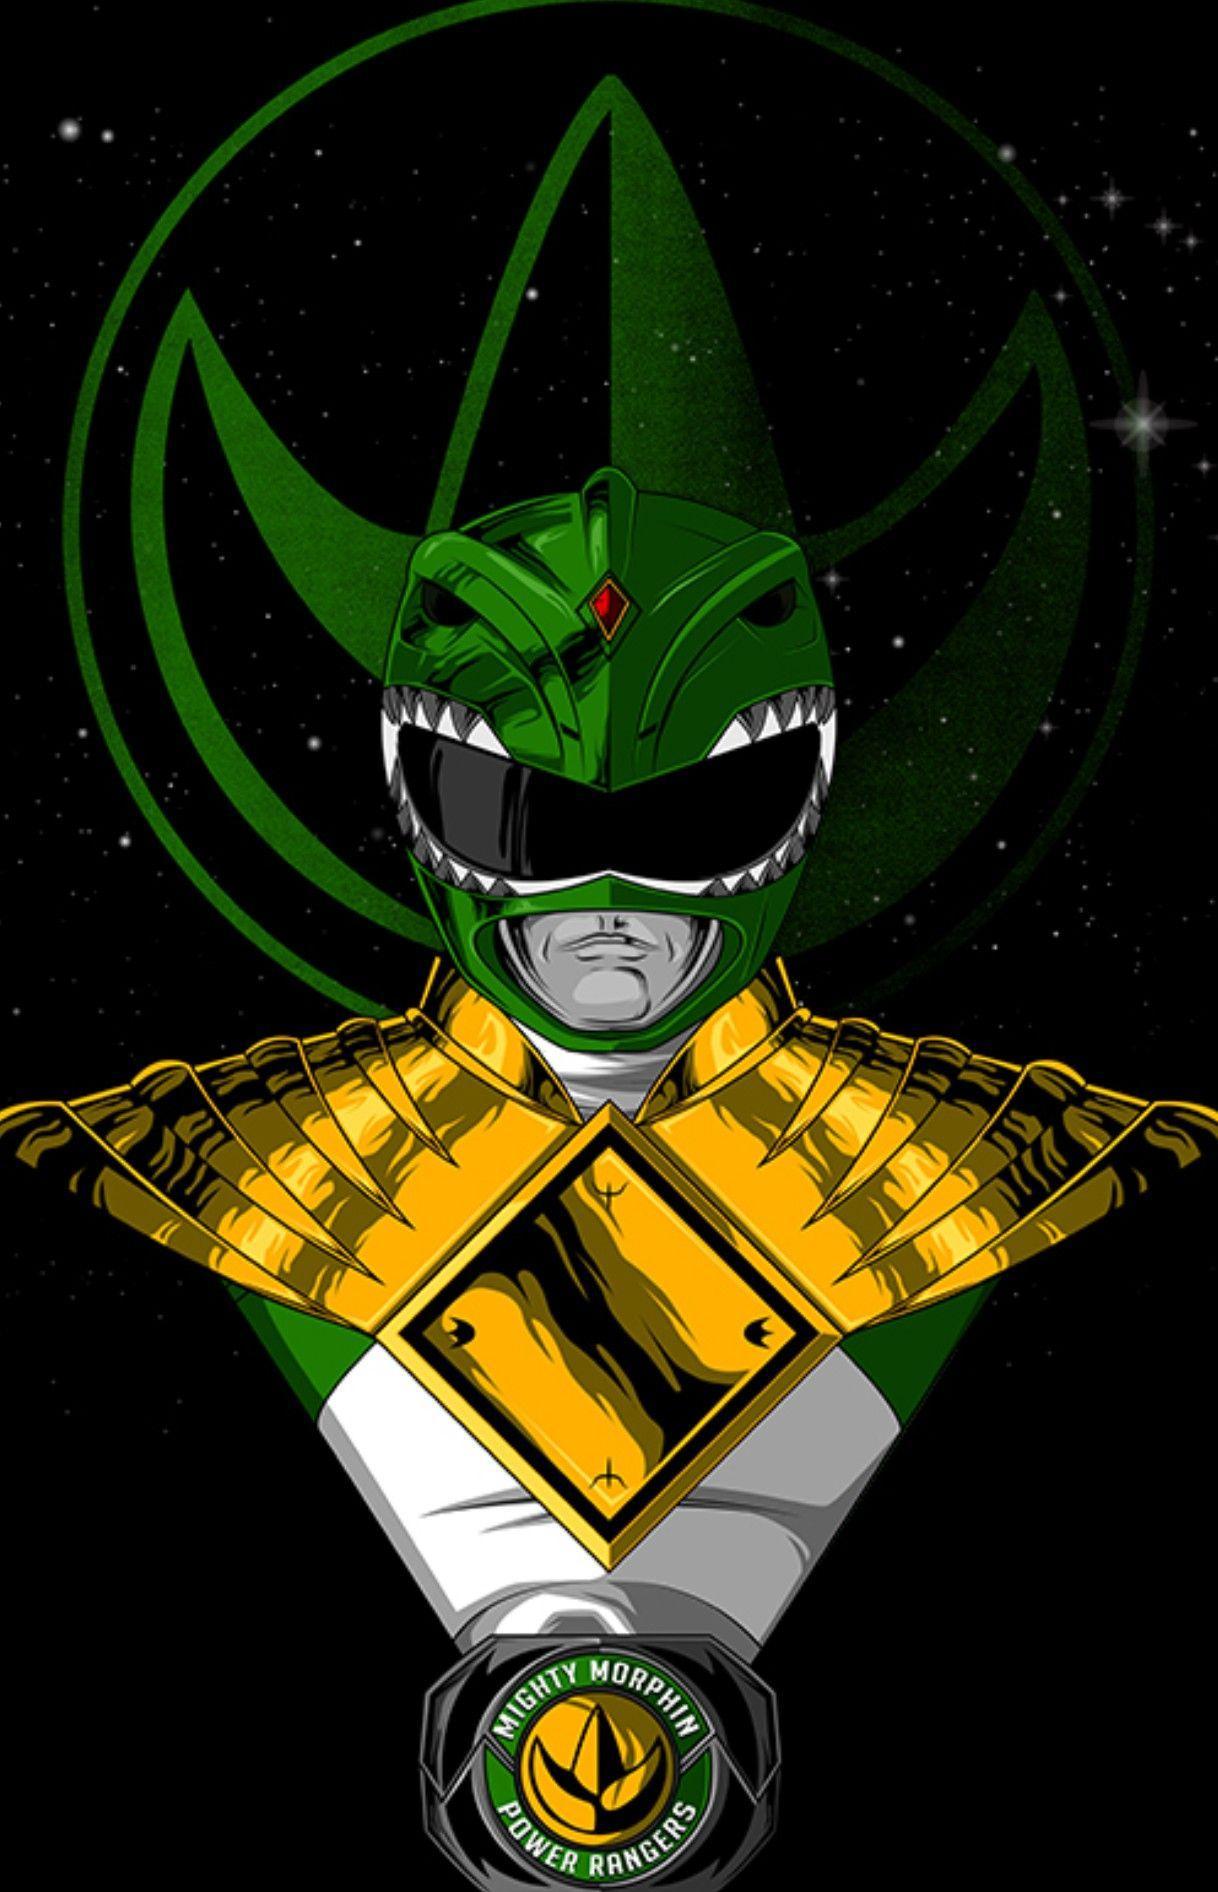 Green Power Ranger Phone Wallpapers - Wallpaper Cave